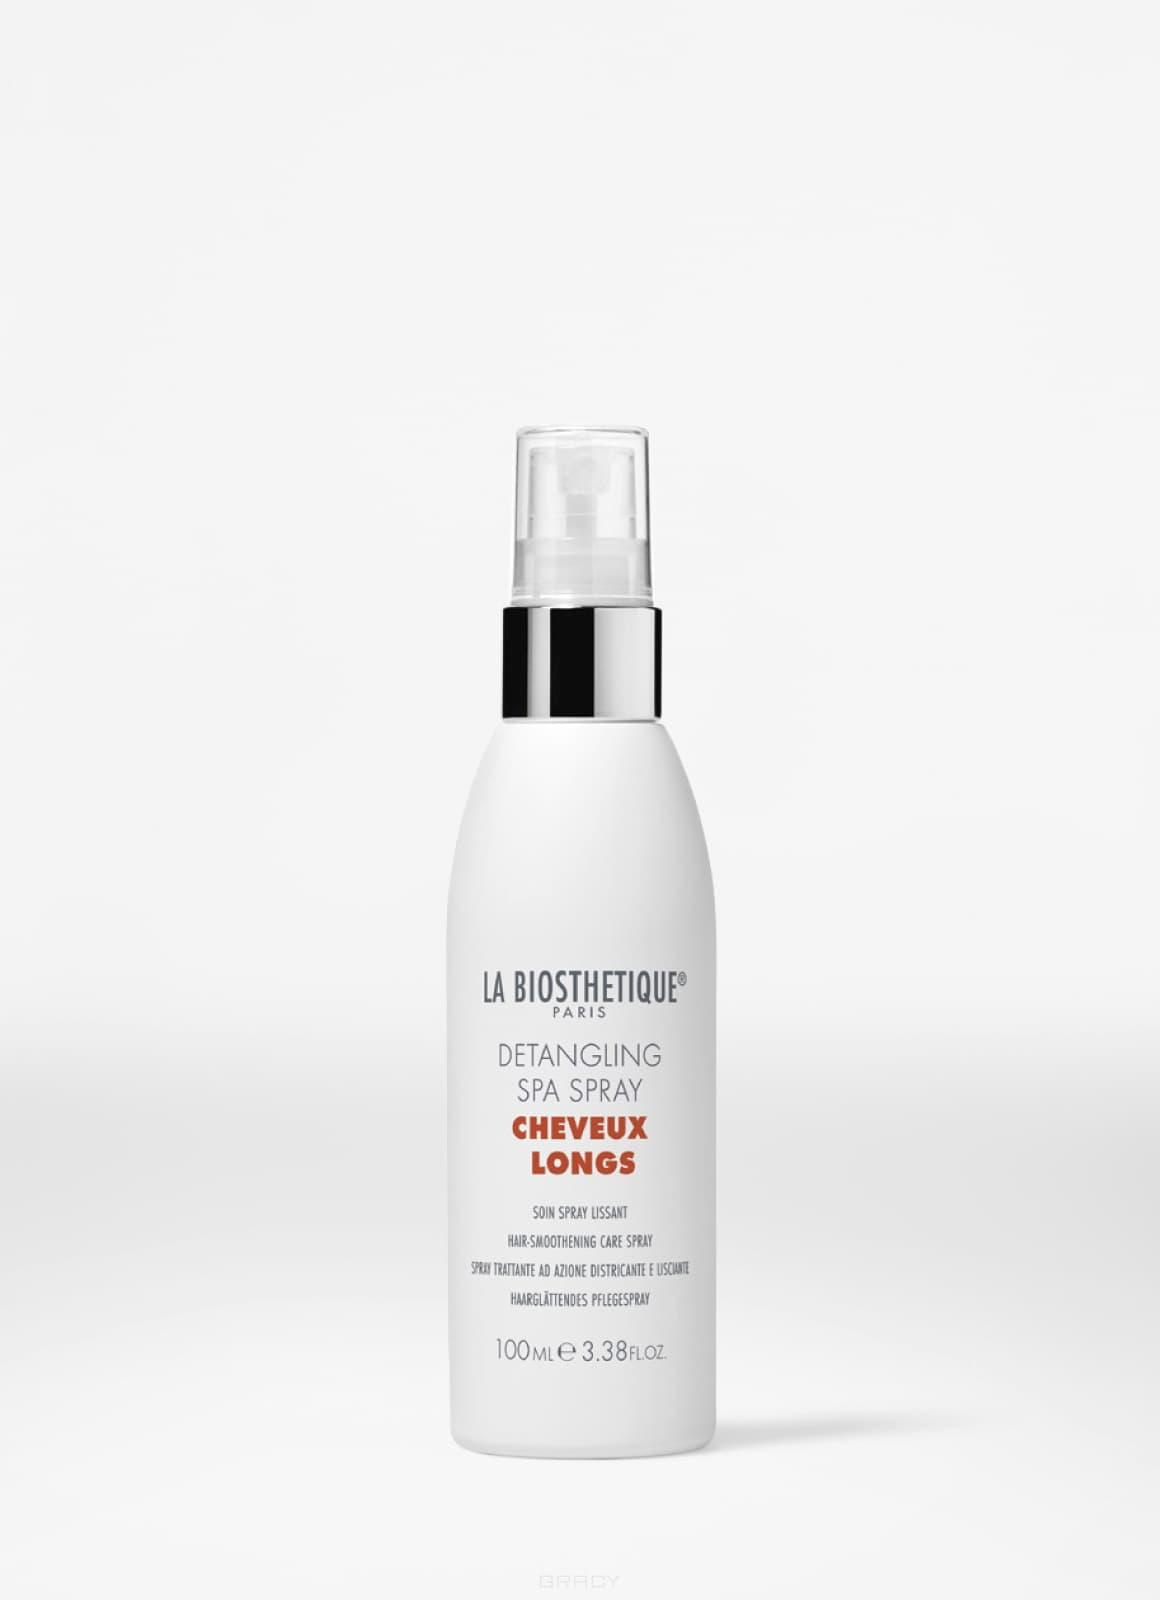 La Biosthetique SPA-спрей для придания гладкости волосам Detangling Spa Spray, 100 мл спрей labiosthetique heat protector 100 мл